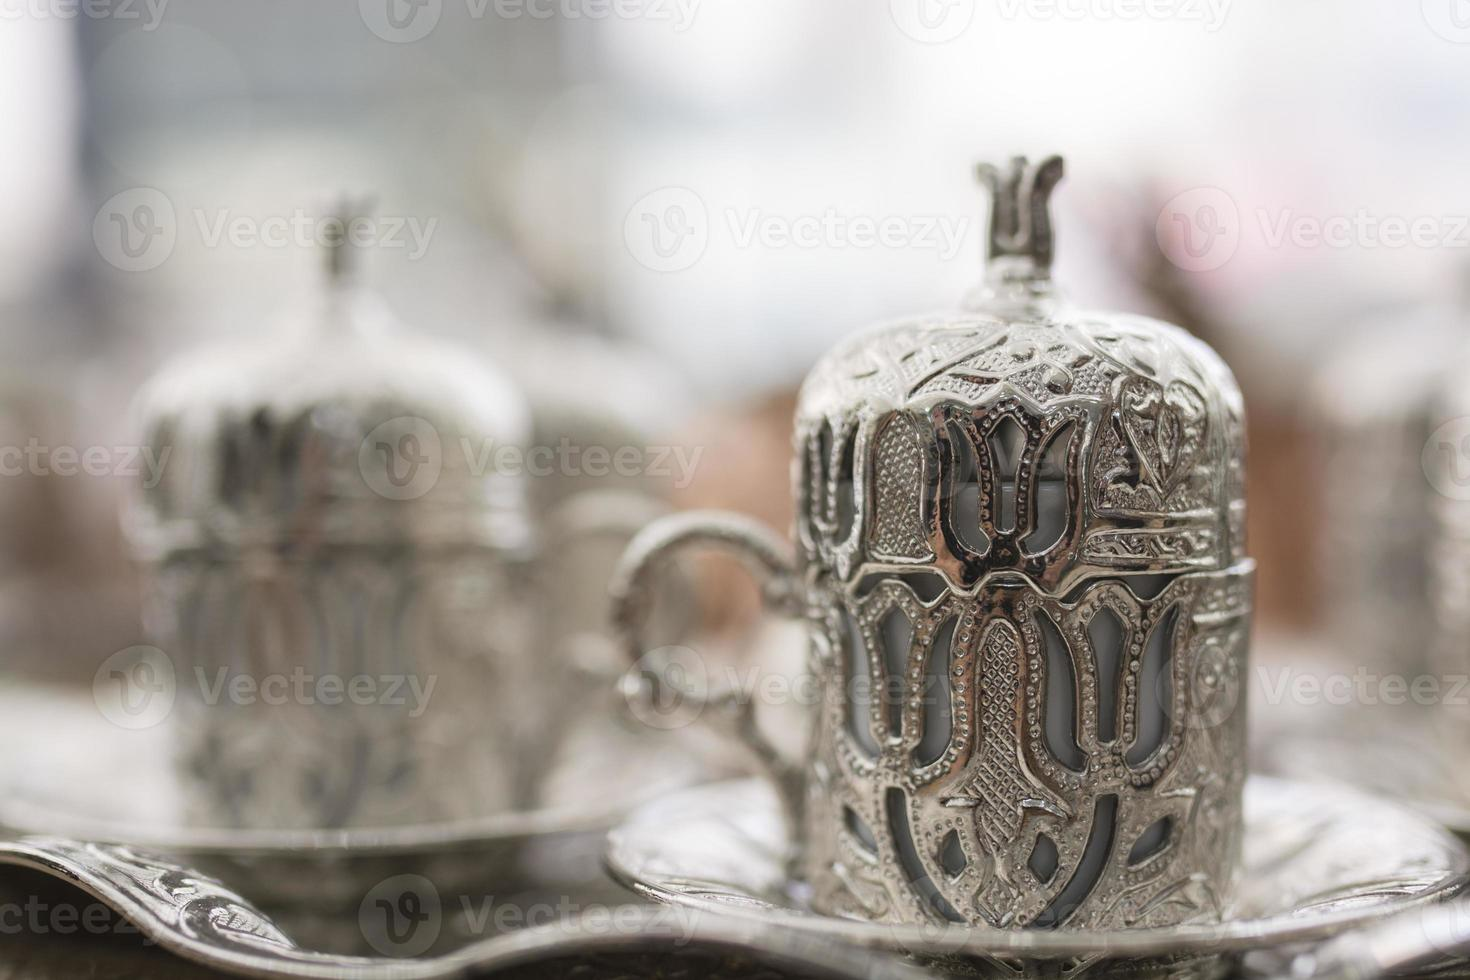 traditionele Turkse koffie met metalen beker foto